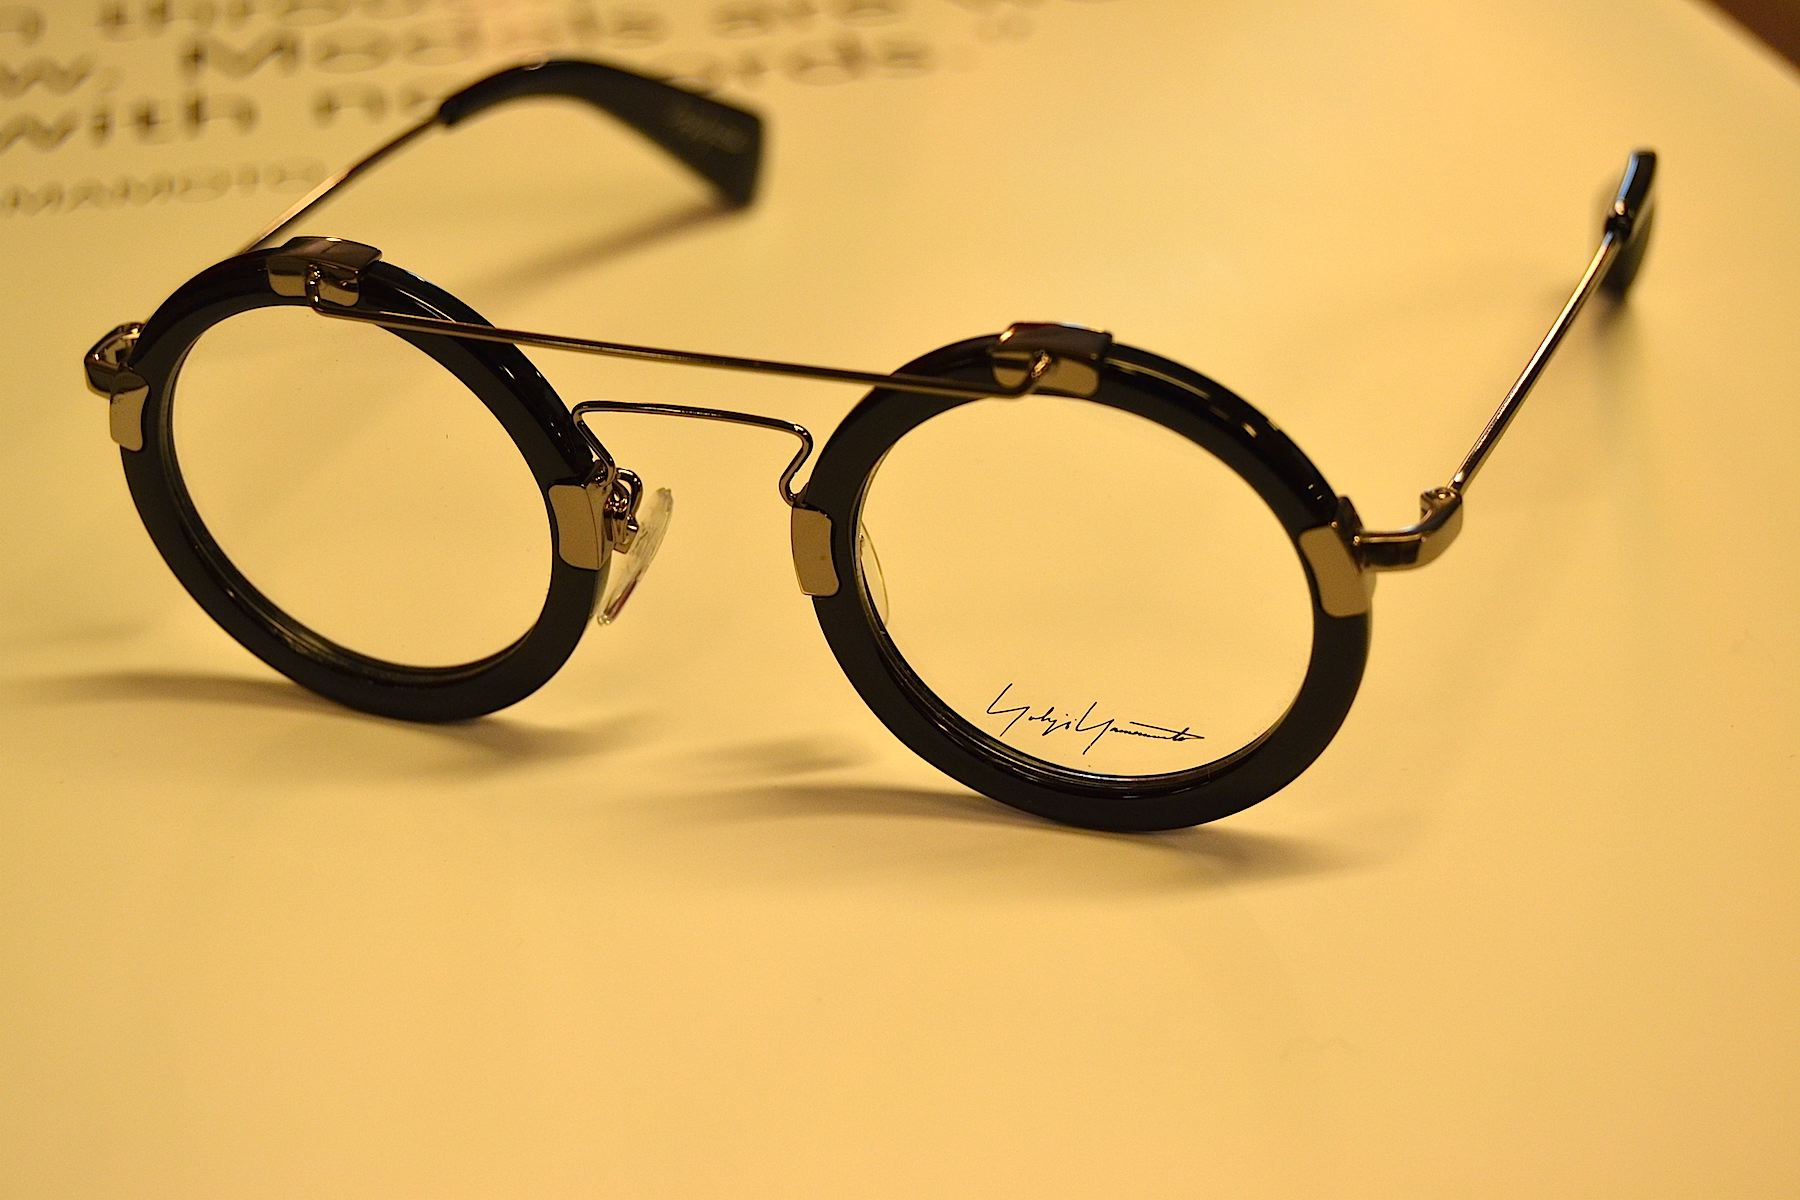 lenastore-bergamo-lenafashion-shop-online-yohji-yamamoto-gli-occhiali-sunglasses-4